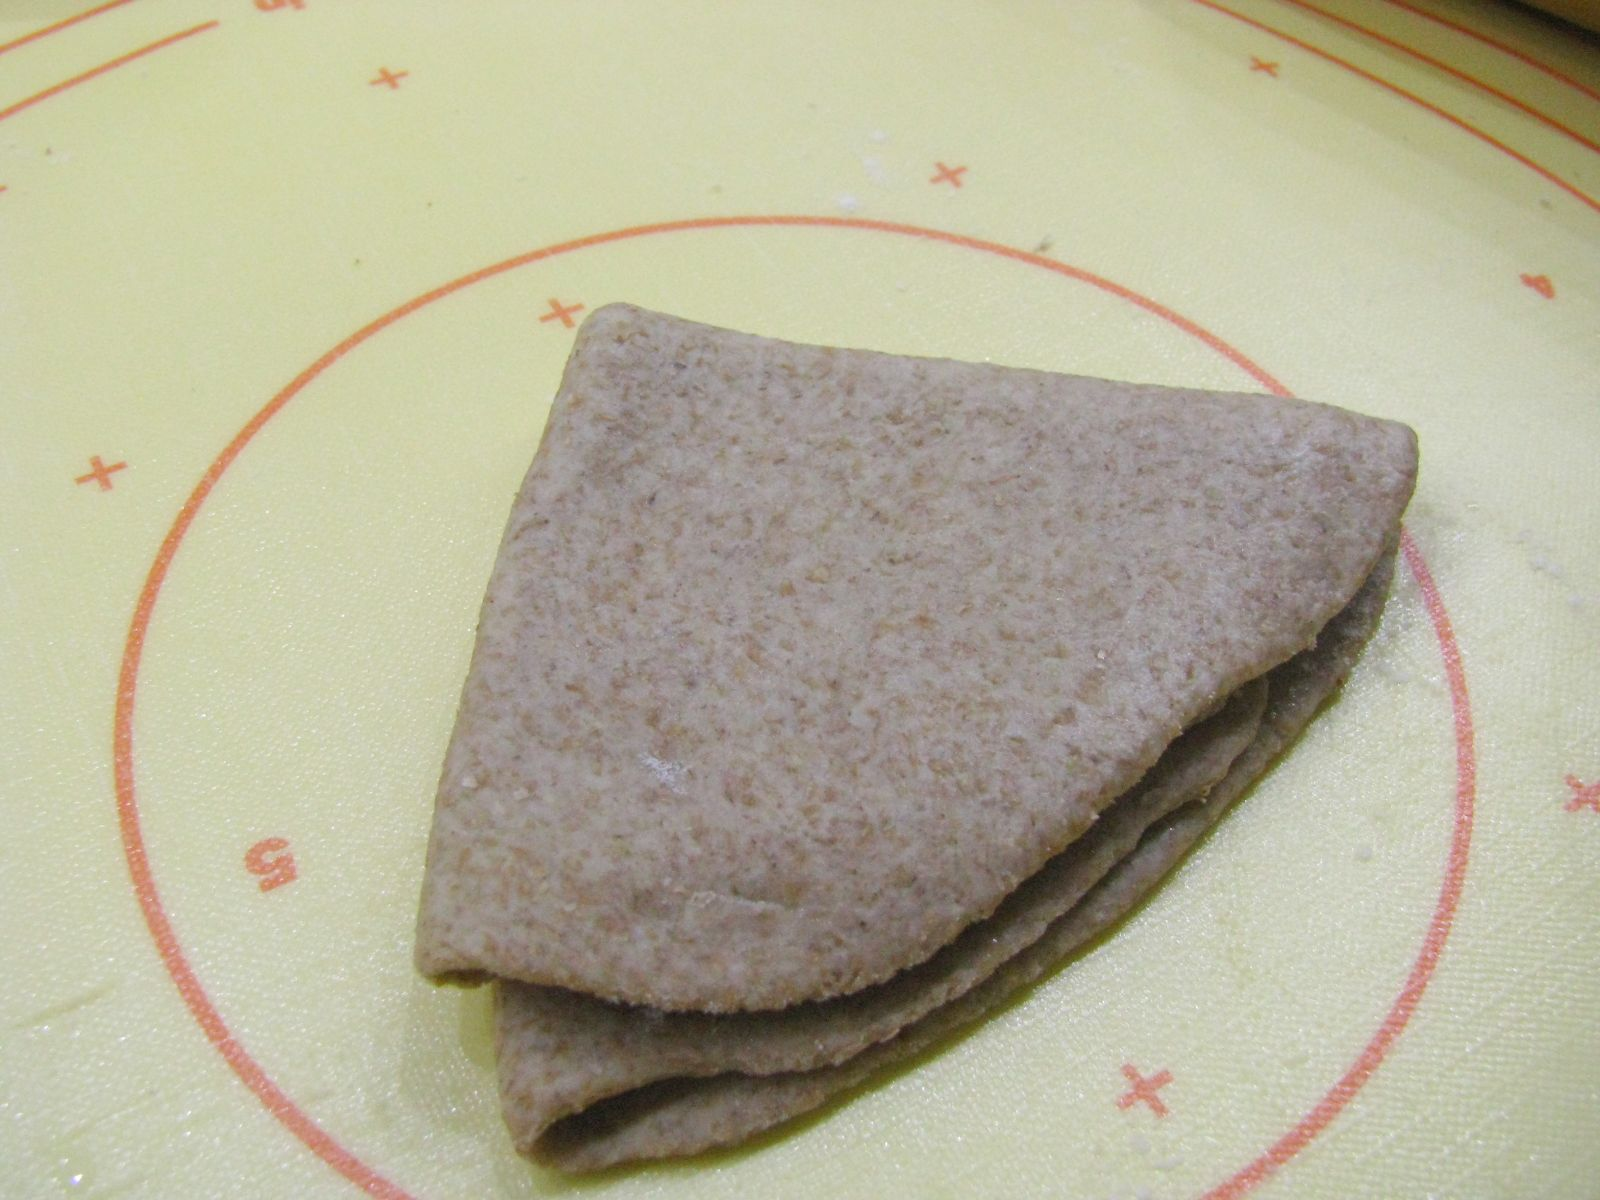 chapati prelozenie na trojuholnik